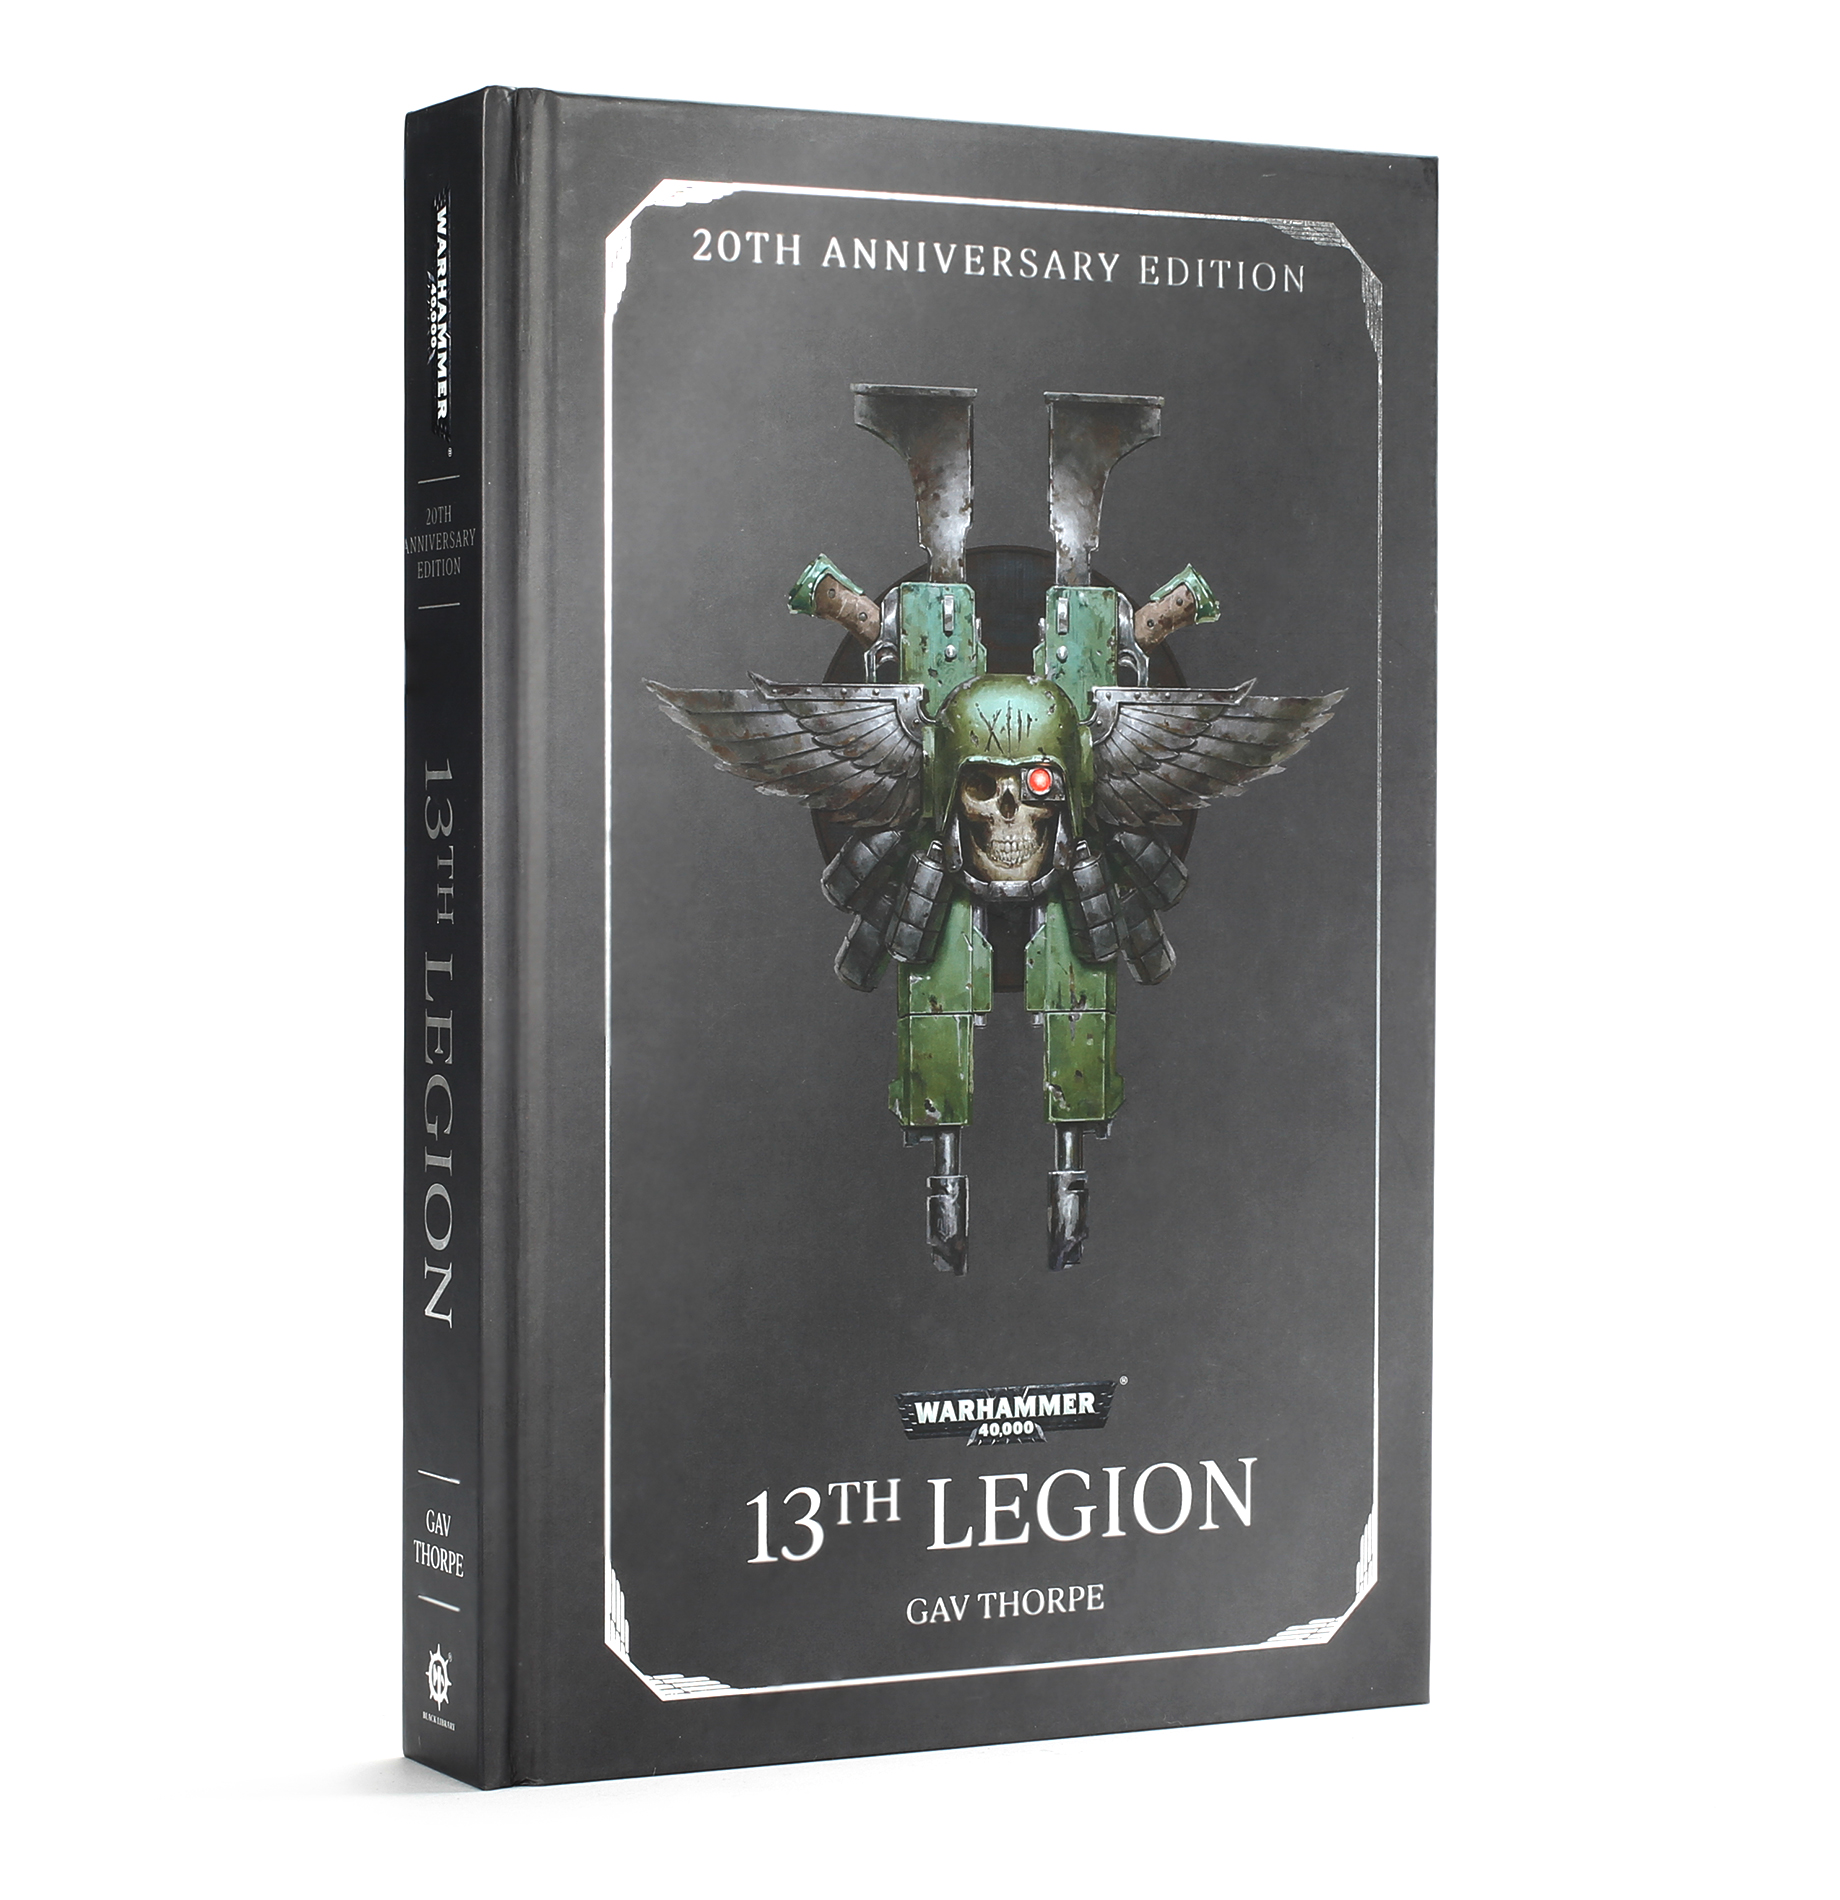 13th Legion, 20th Anniversary Edition, Black Library